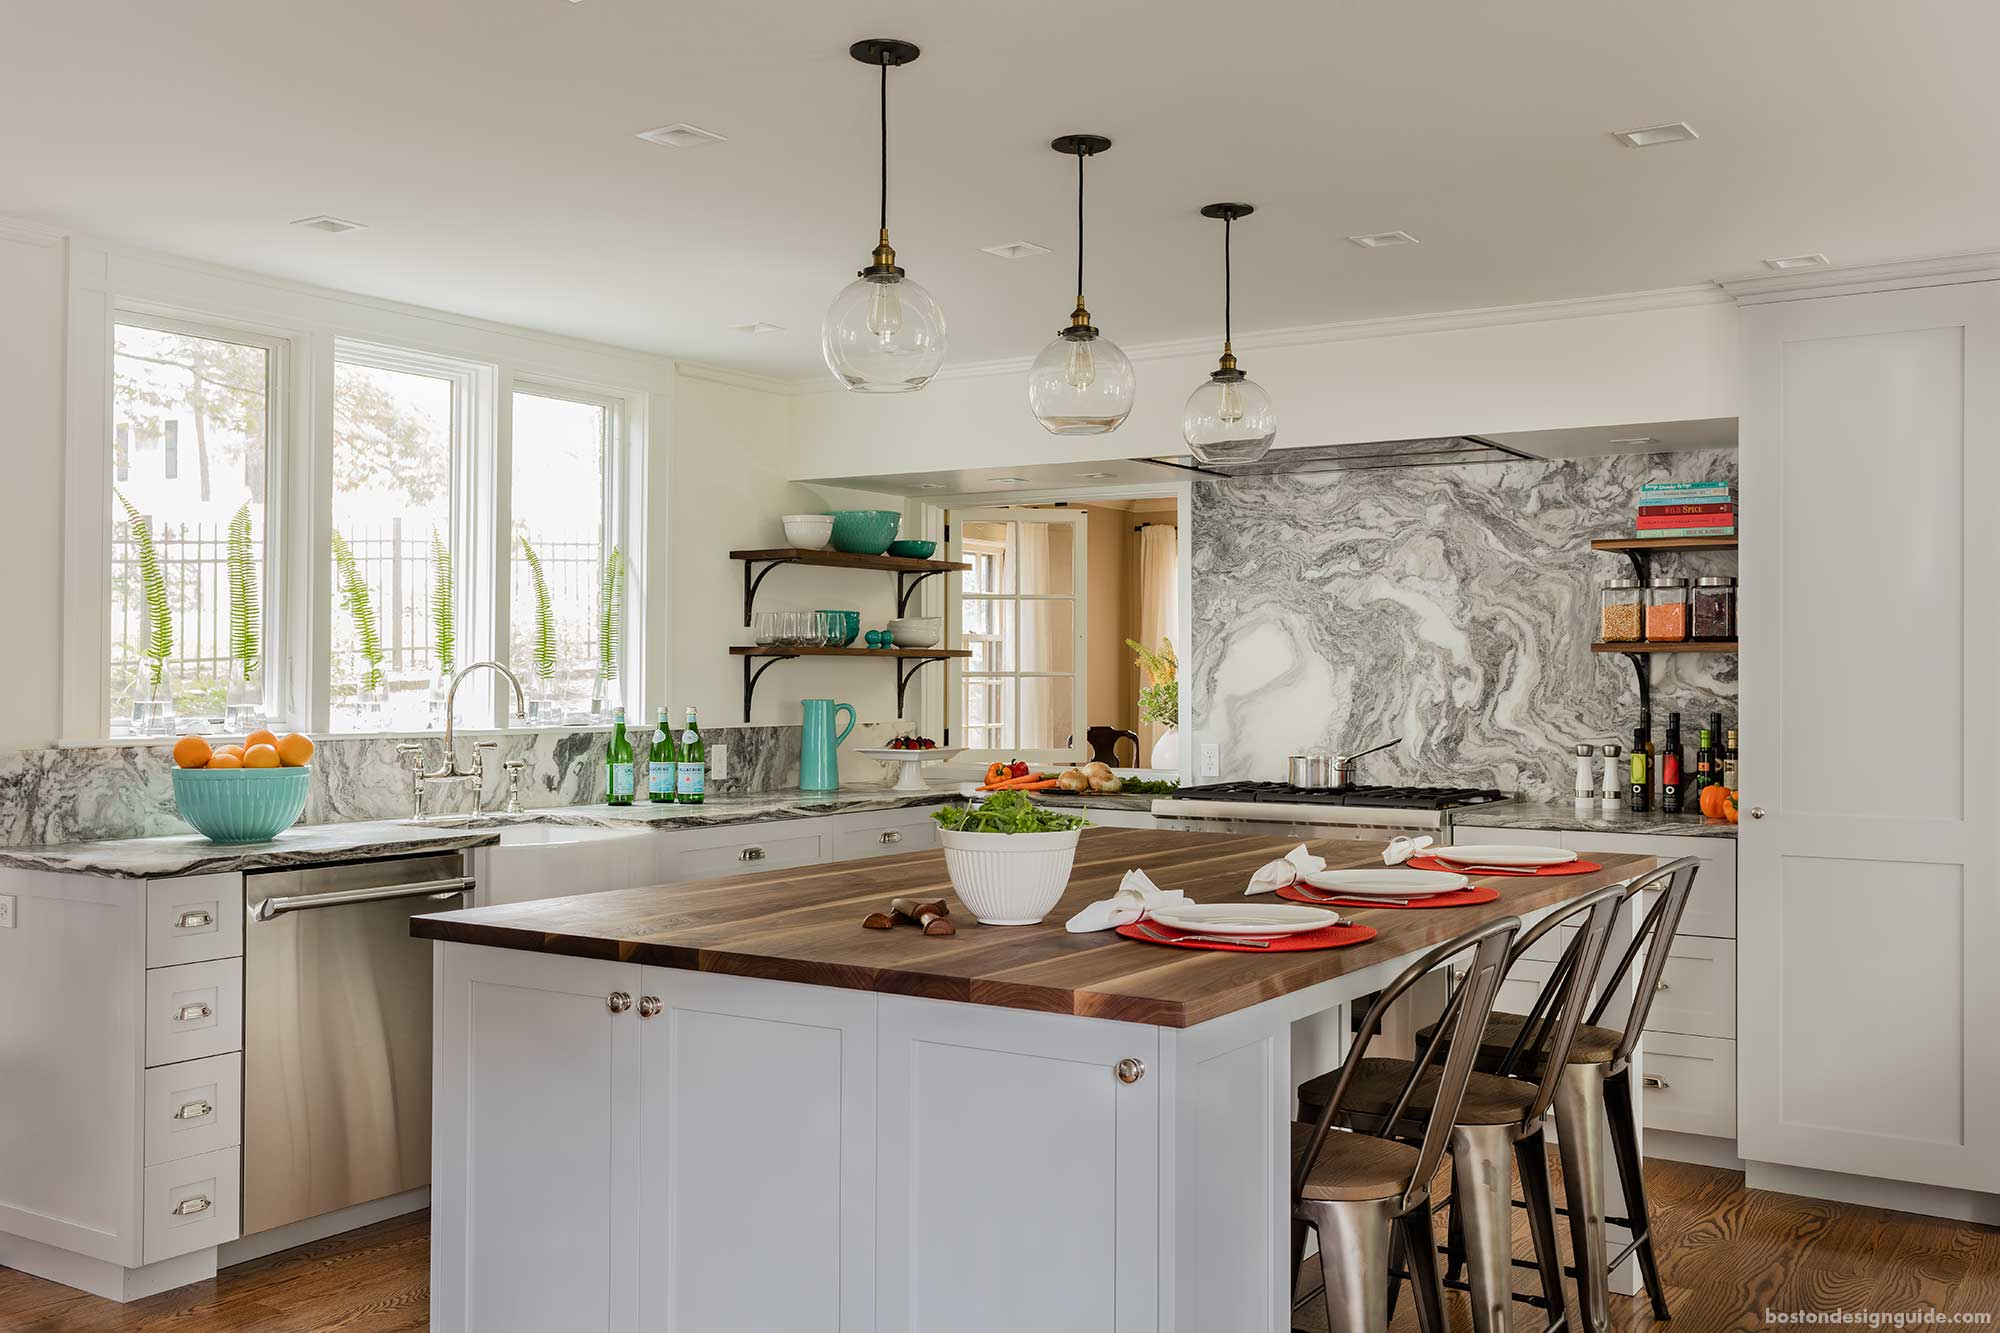 A 100-Year-Old Boston Home Kitchen Remodel | Boston Design Guide